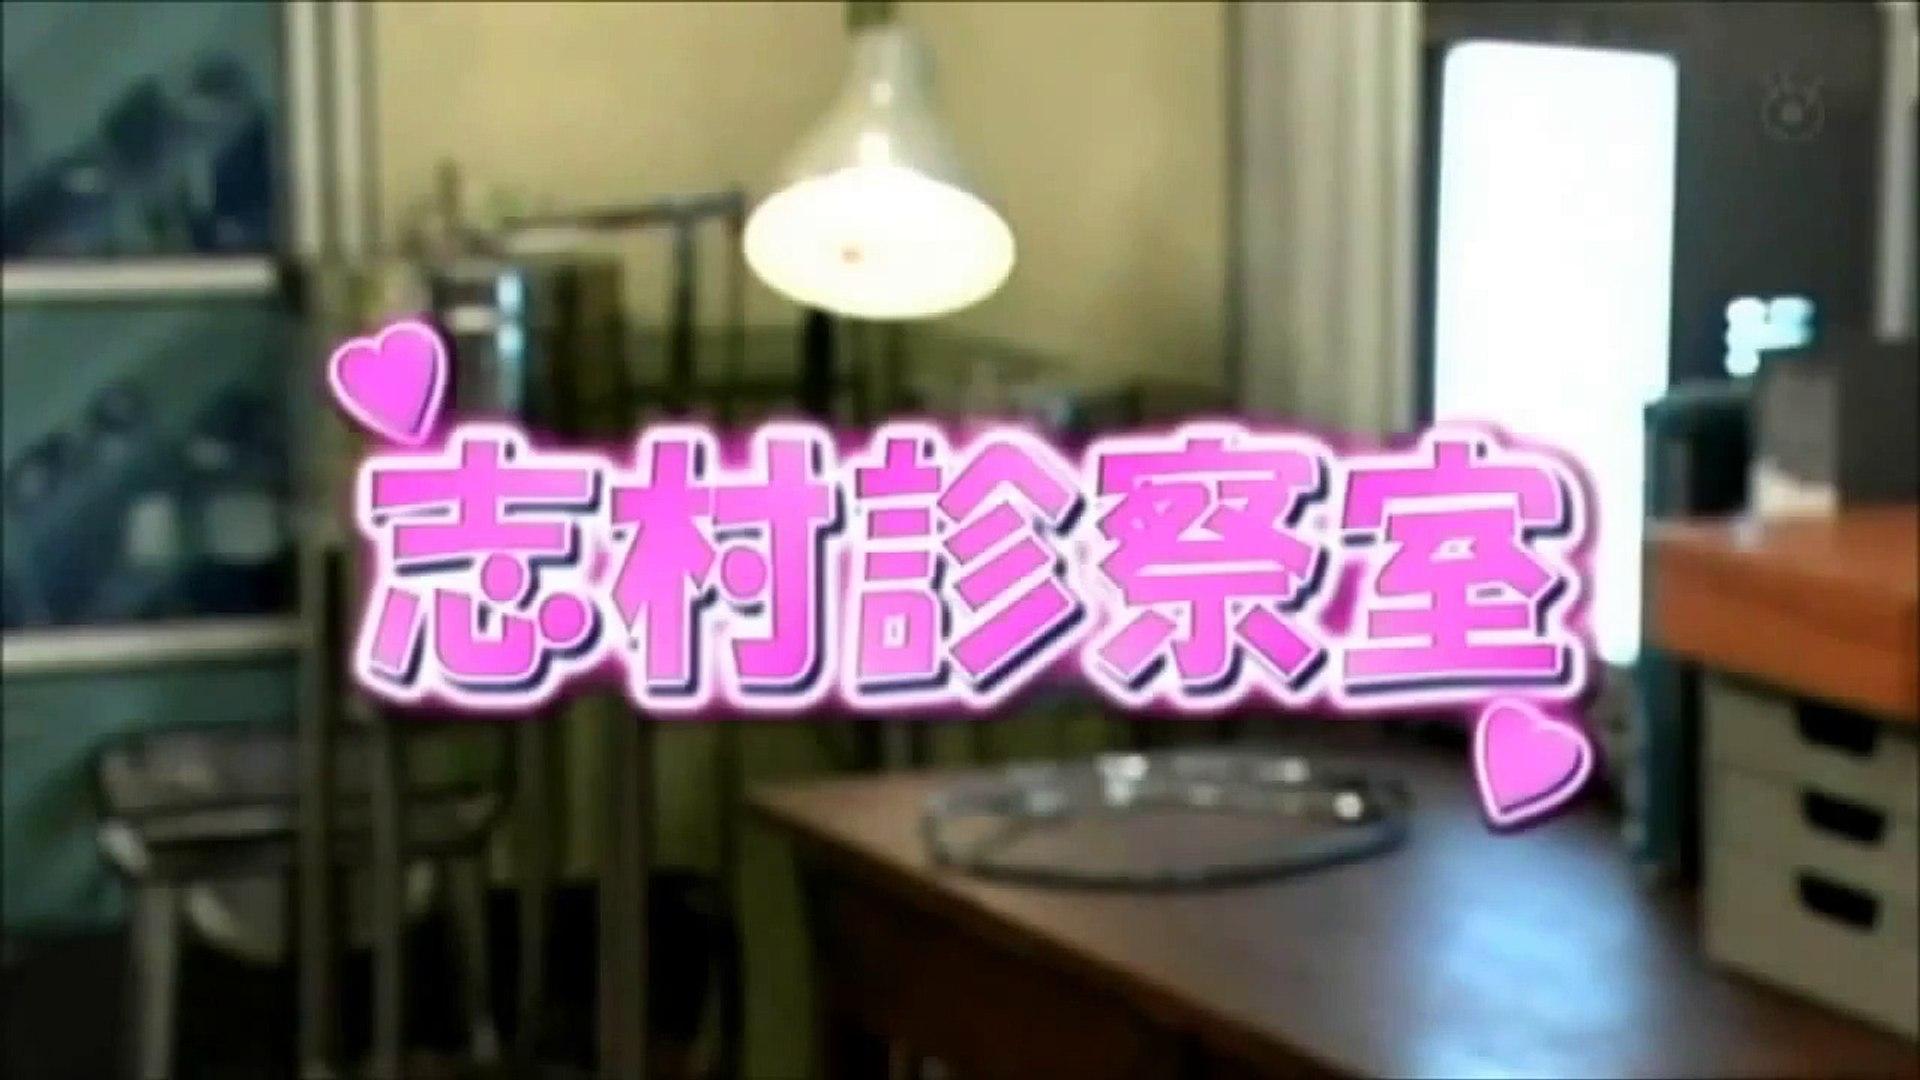 Best prank compilation Korean funny game show Japanese funny pranks show Best japanese prank